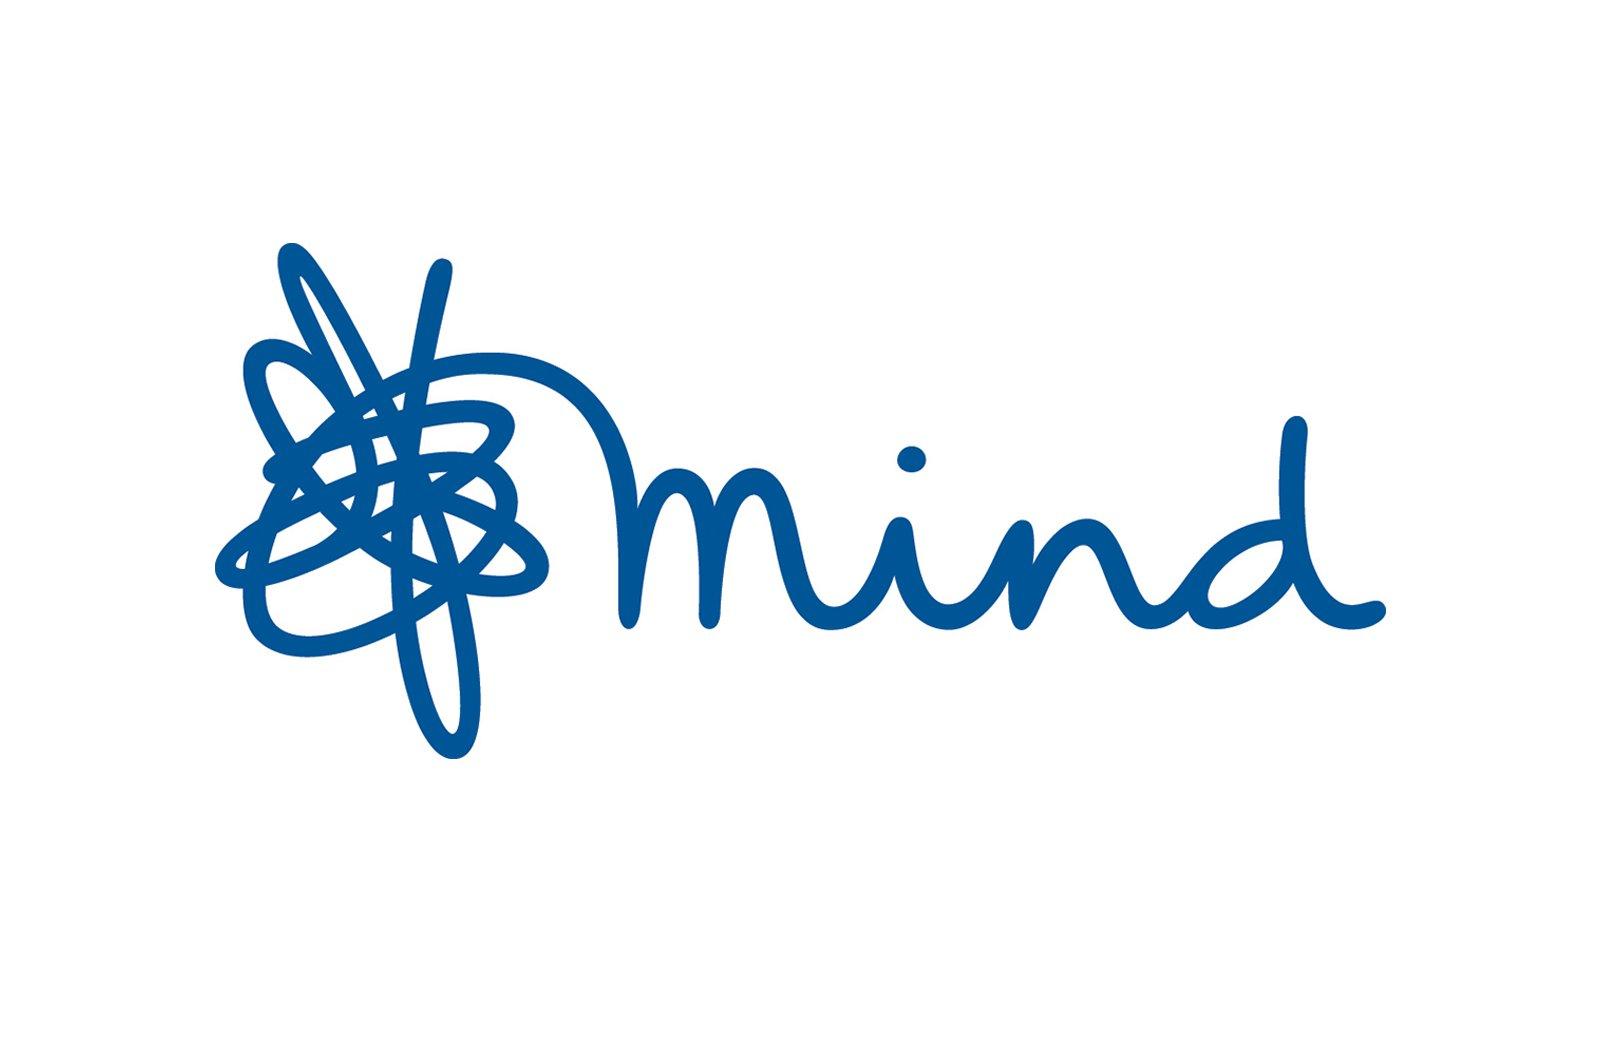 Mind-logo-1-designed-by-Glazer.jpg